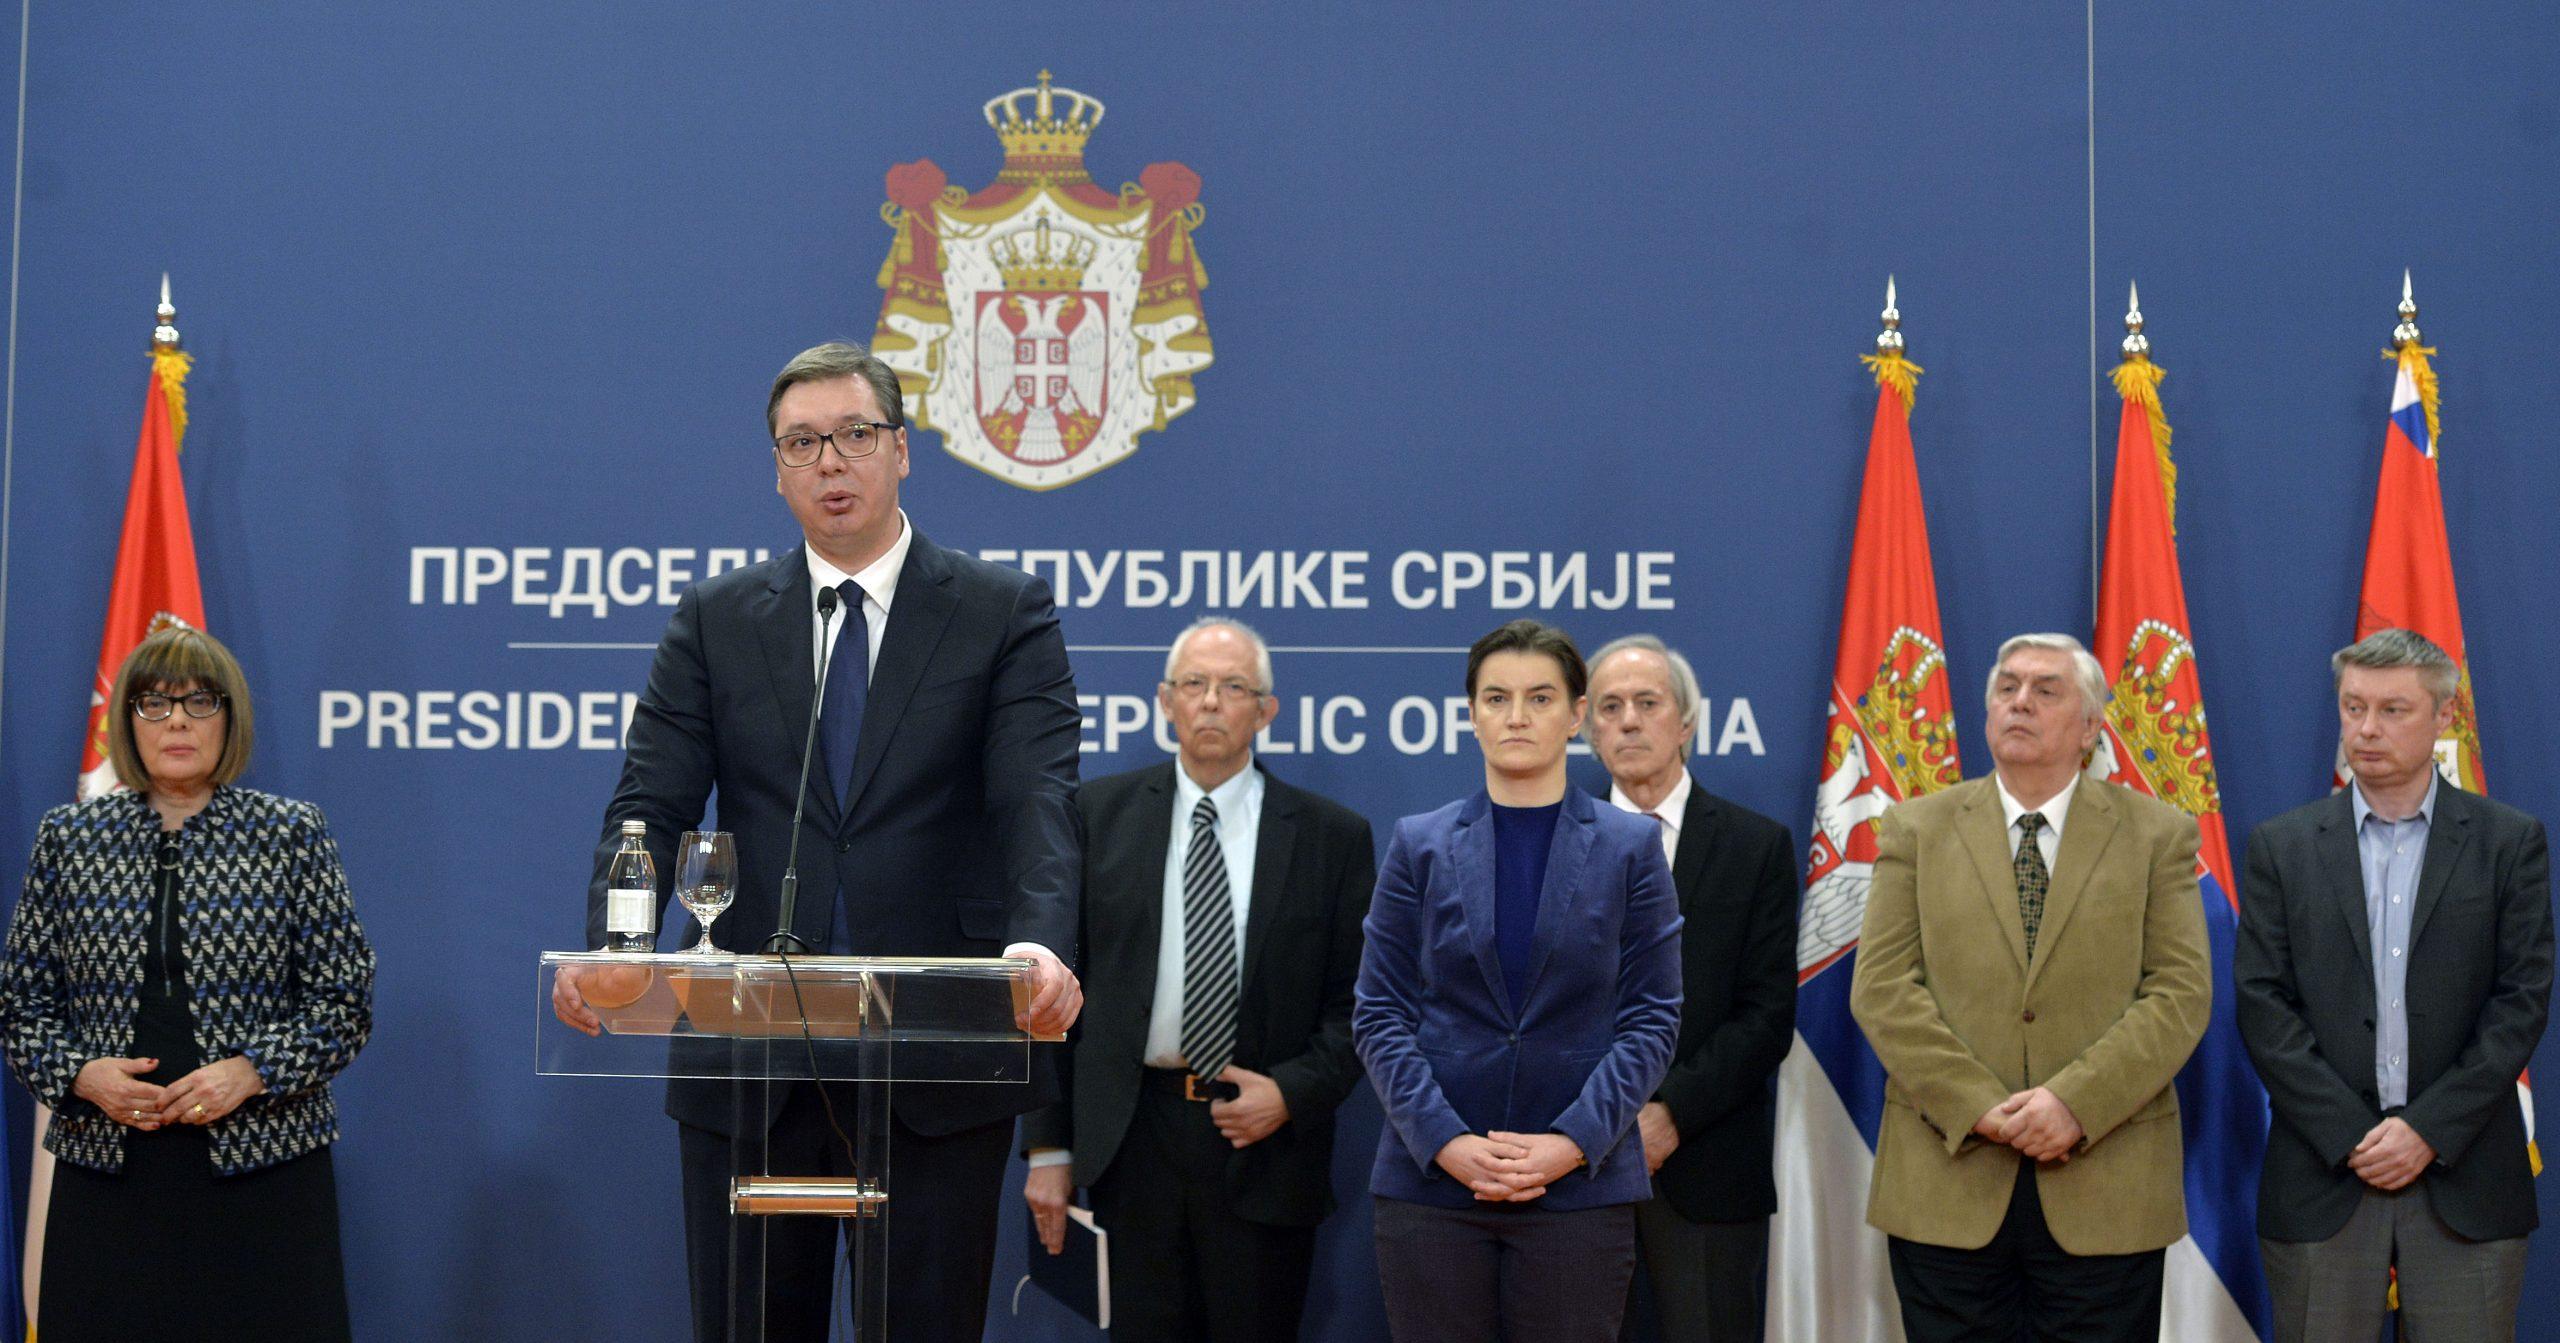 Aleksandar Vučić, predsednnik Srbije